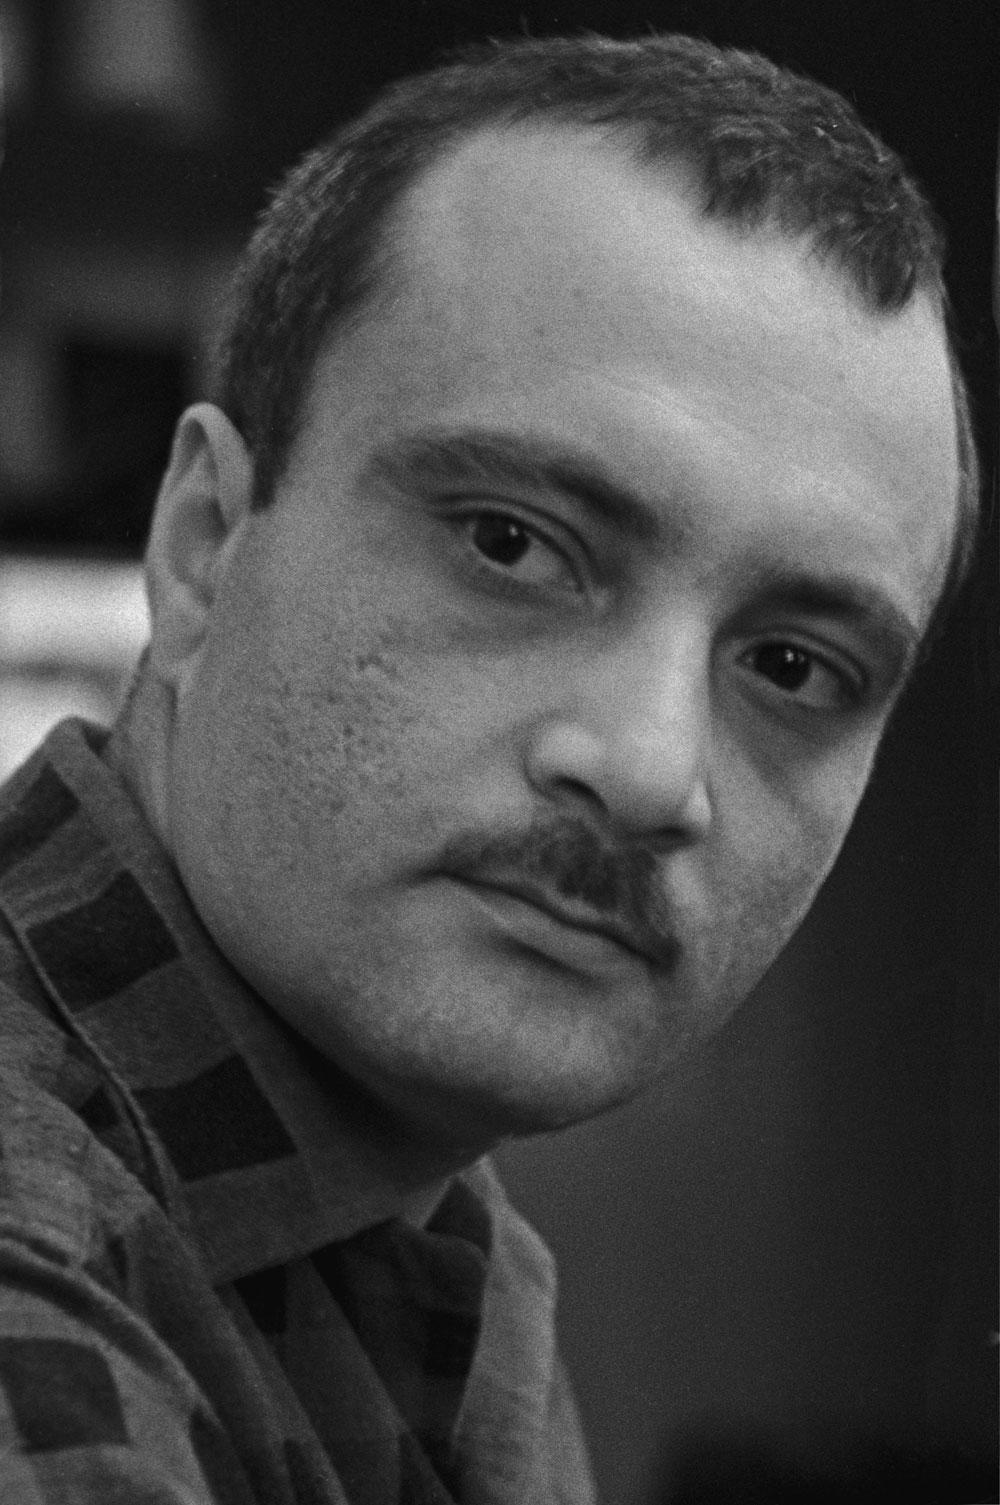 Георгий Данелия. 1965 г.